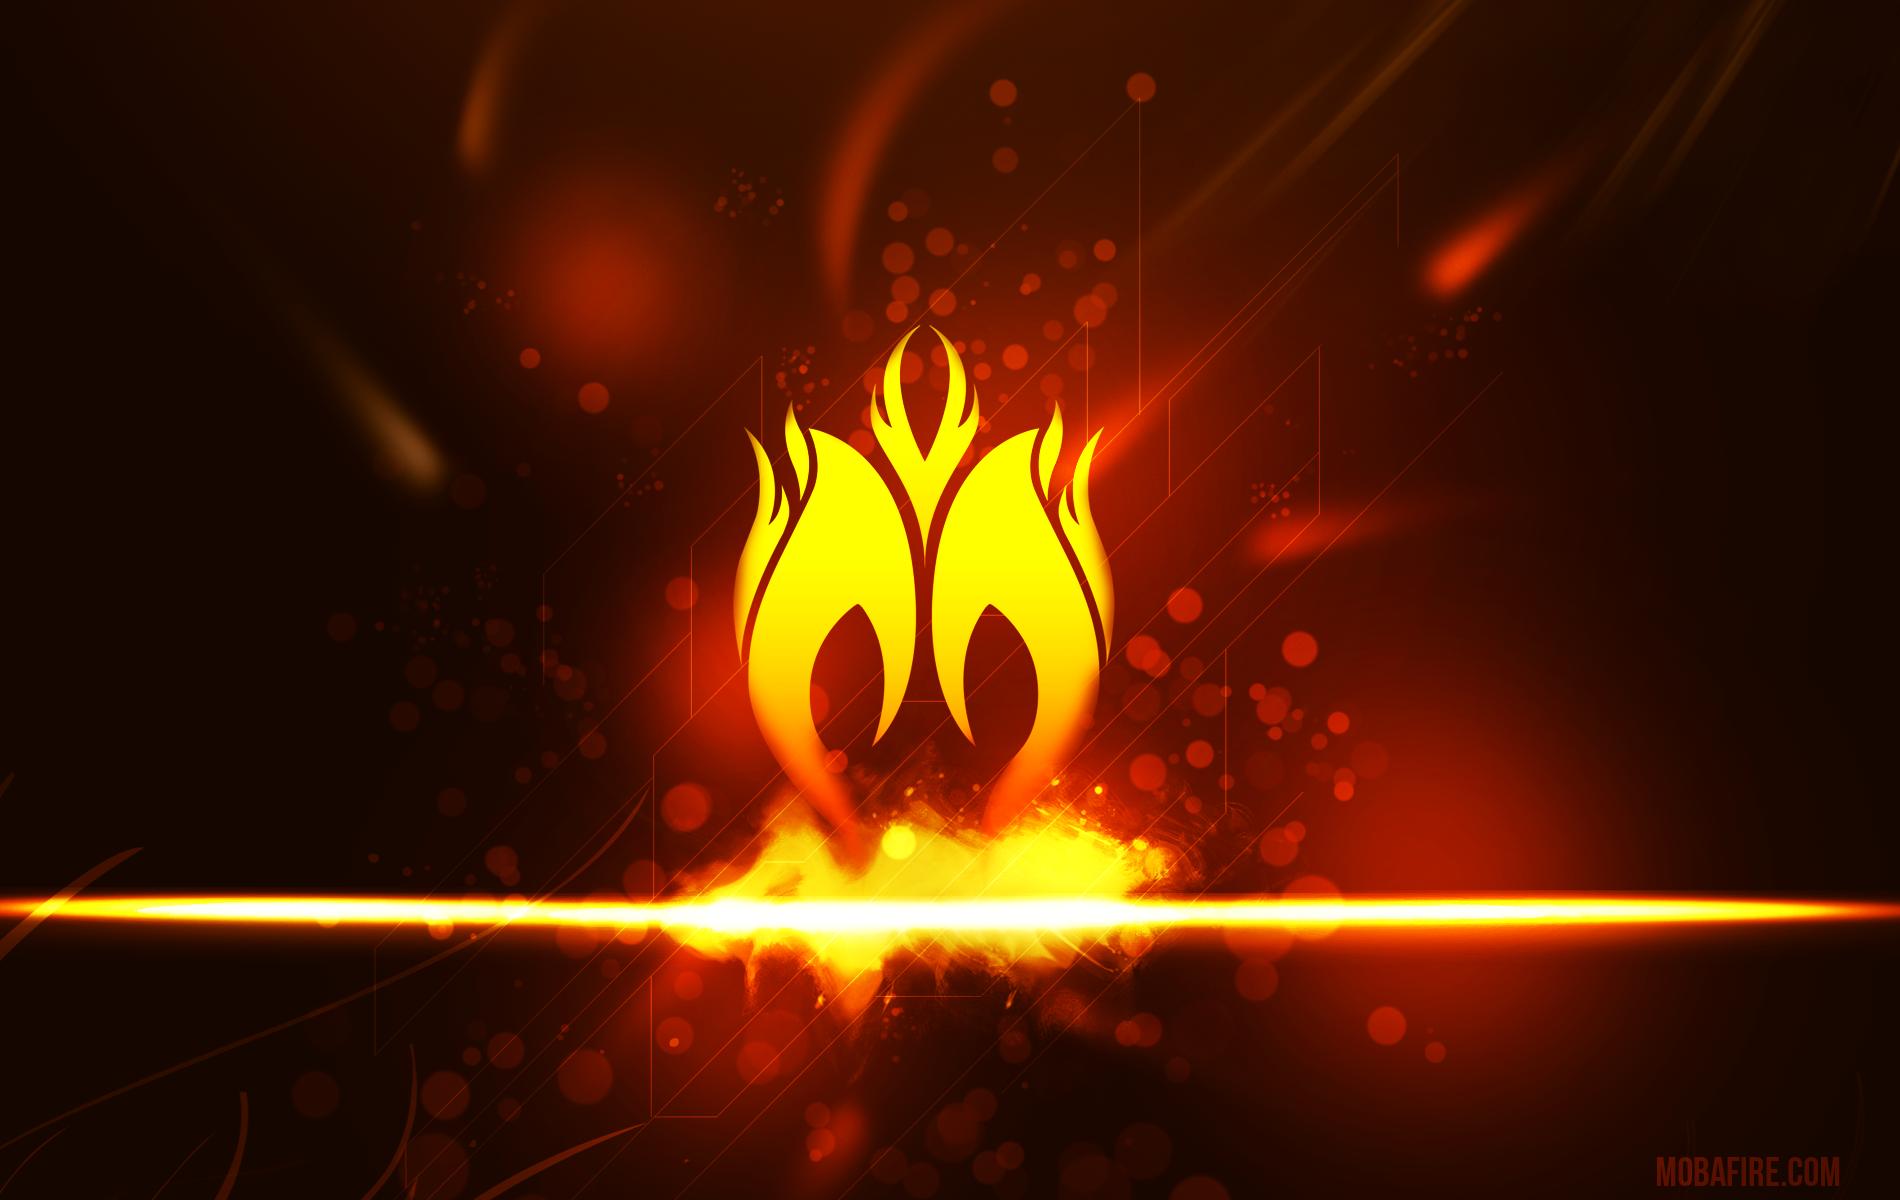 mobafire.com | Logo by Efreak15 | UserLogos.org